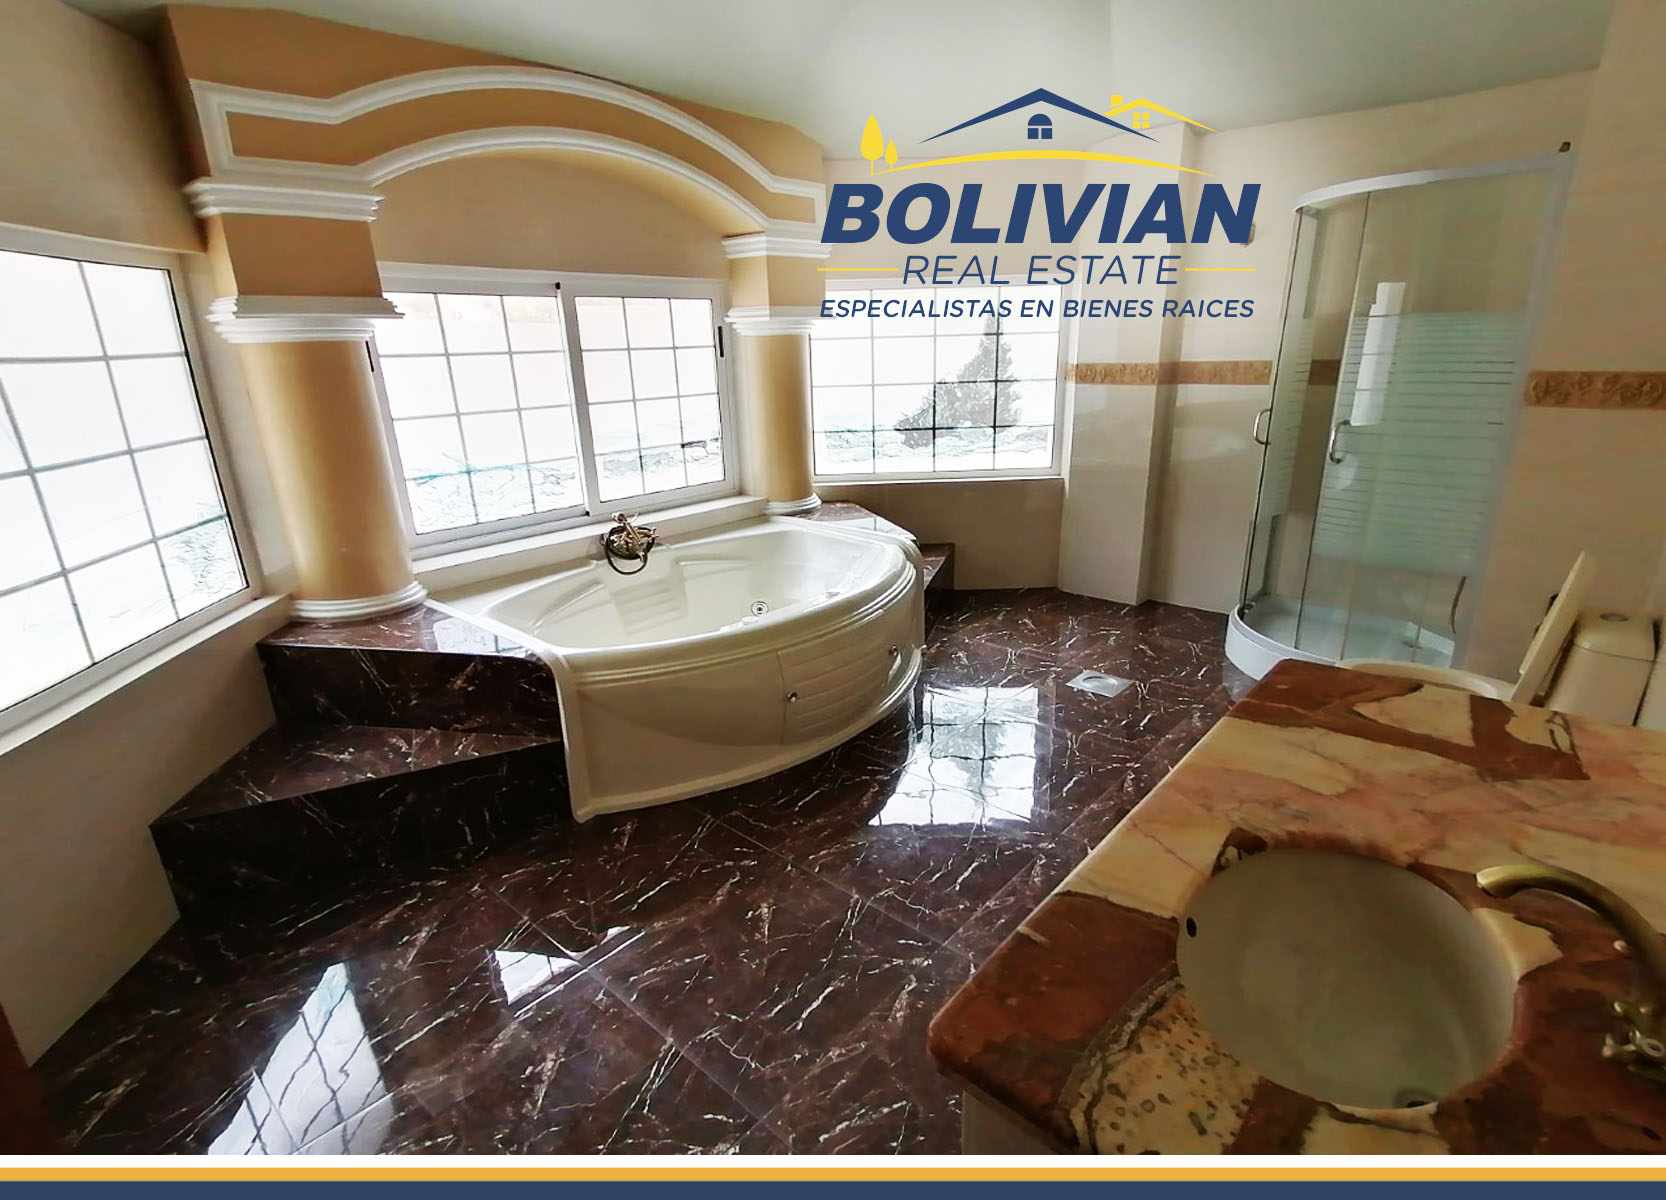 Casa en Alquiler LA FLORIDA - LA RINCONADA ELEGANTE RESIDENCIA  Foto 7